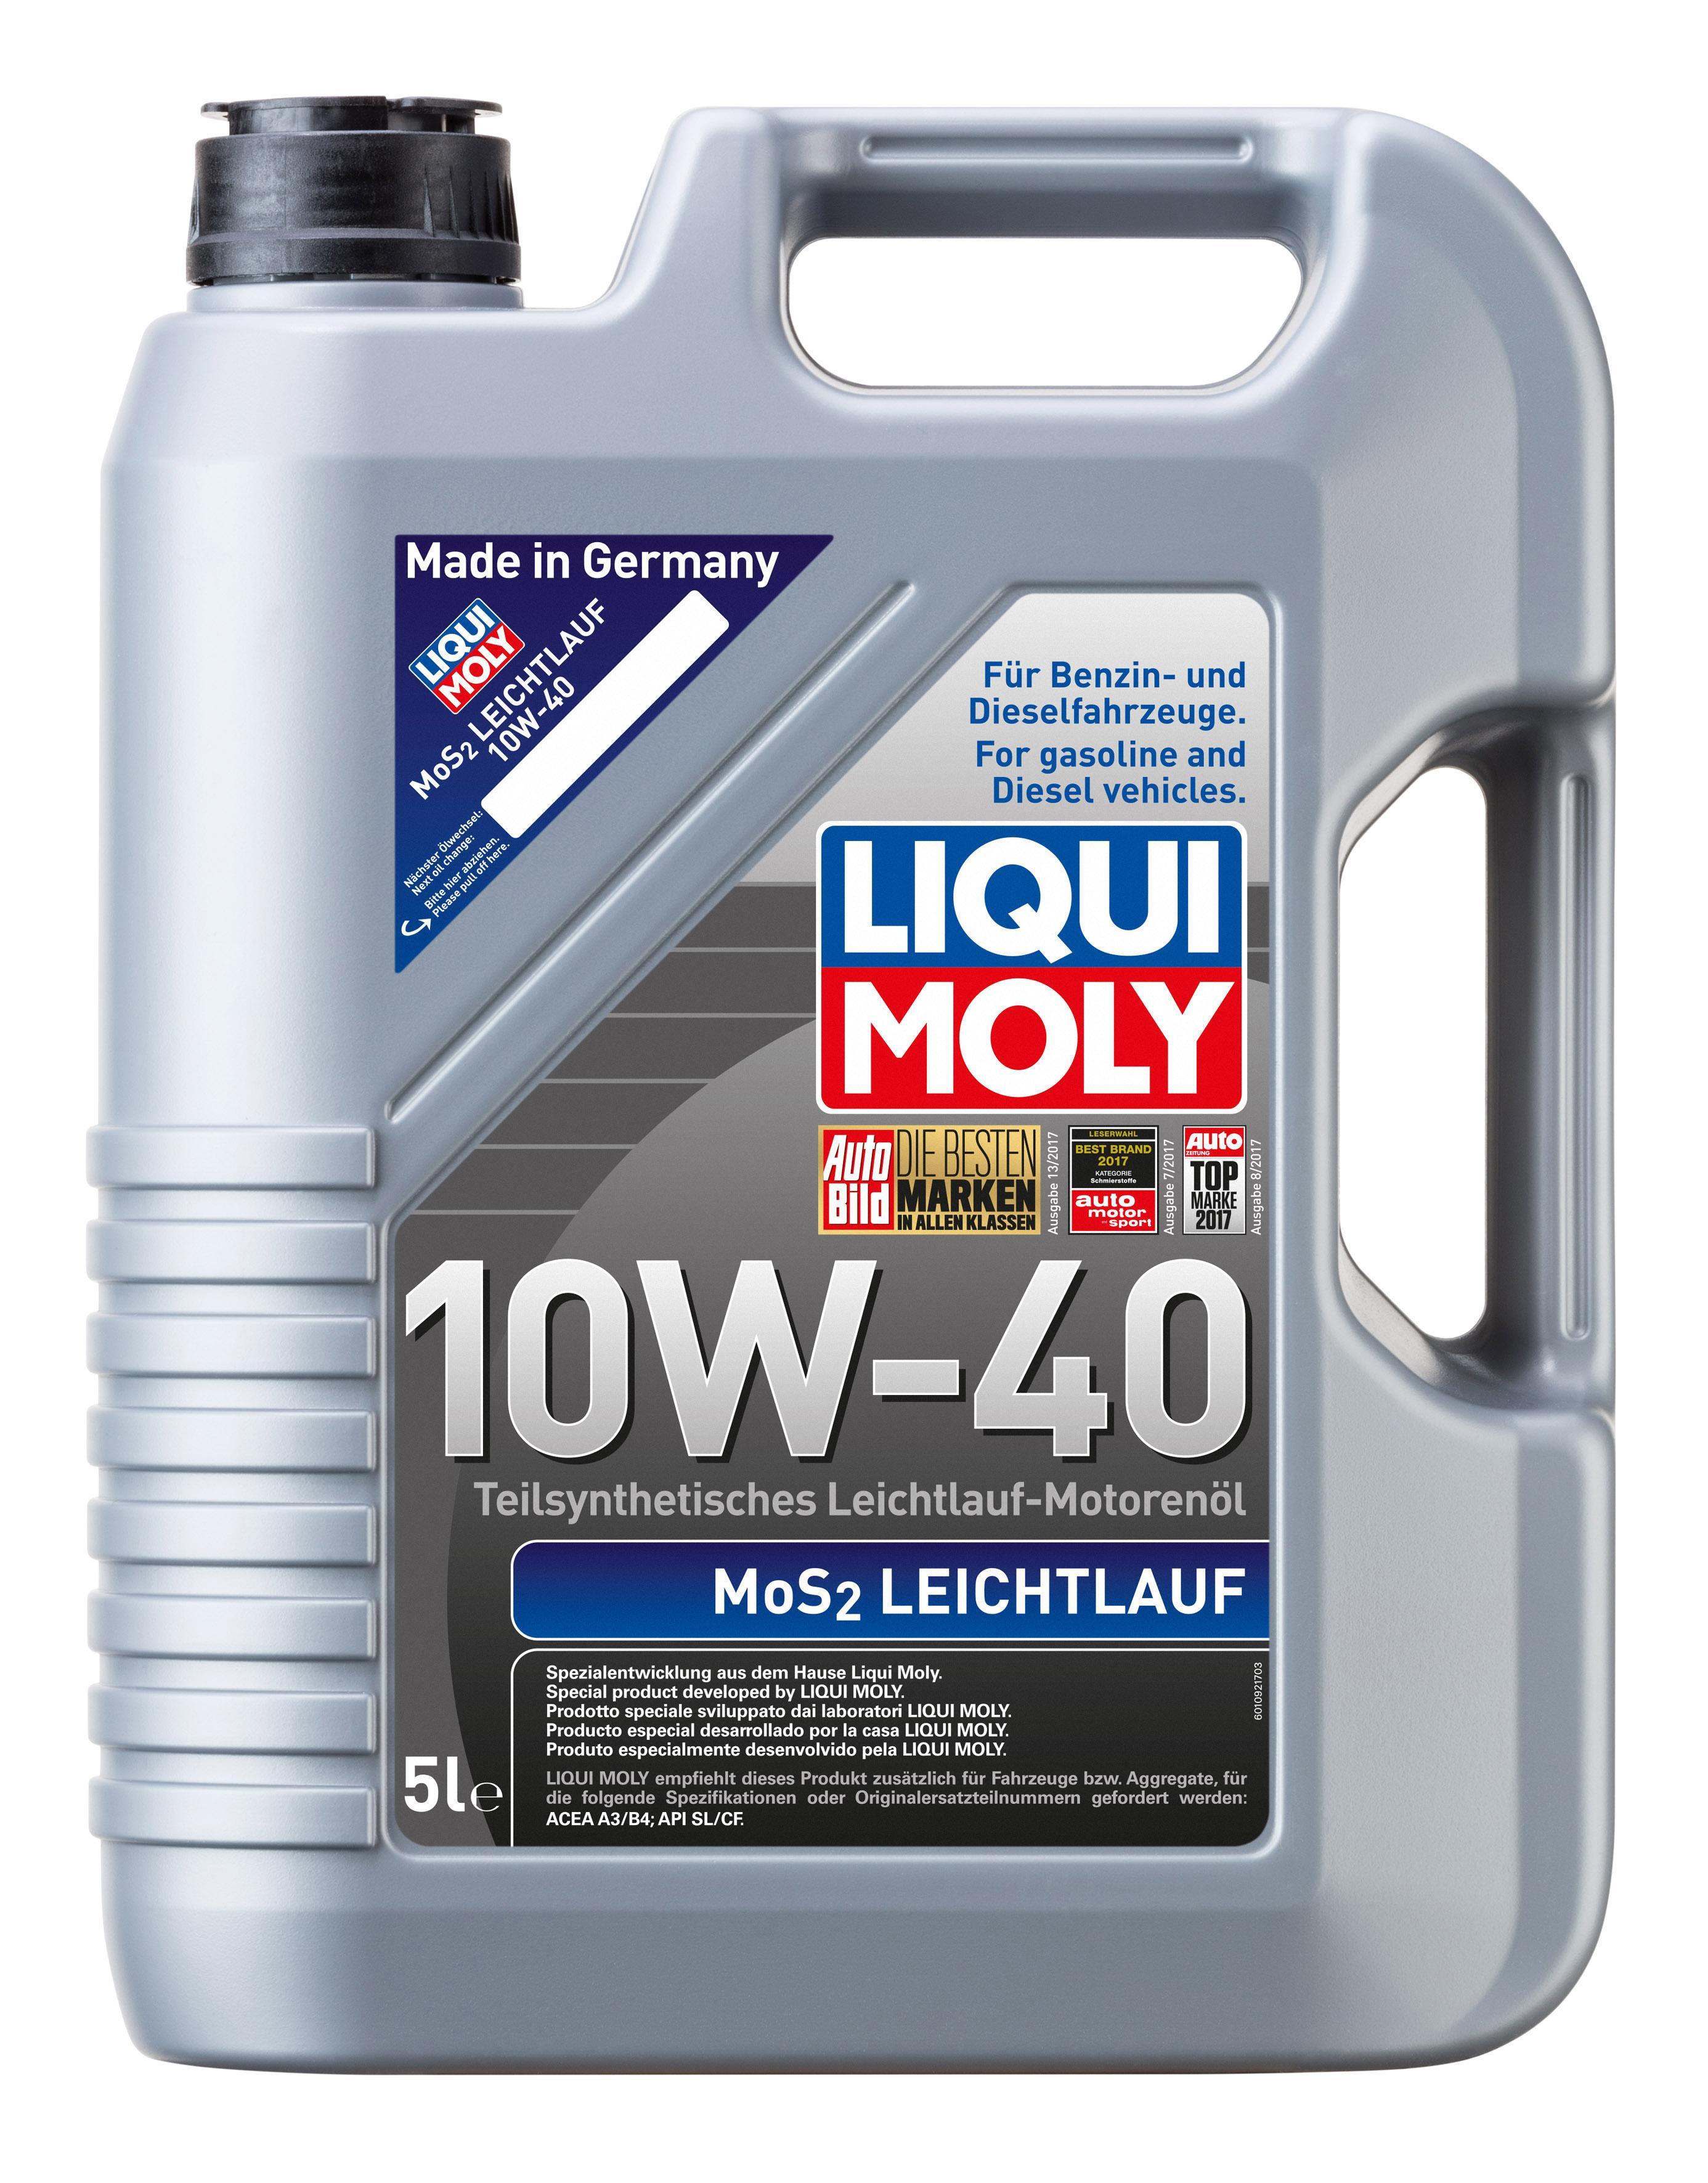 VW SHARAN 2017 Motorenöl - Original LIQUI MOLY 1092